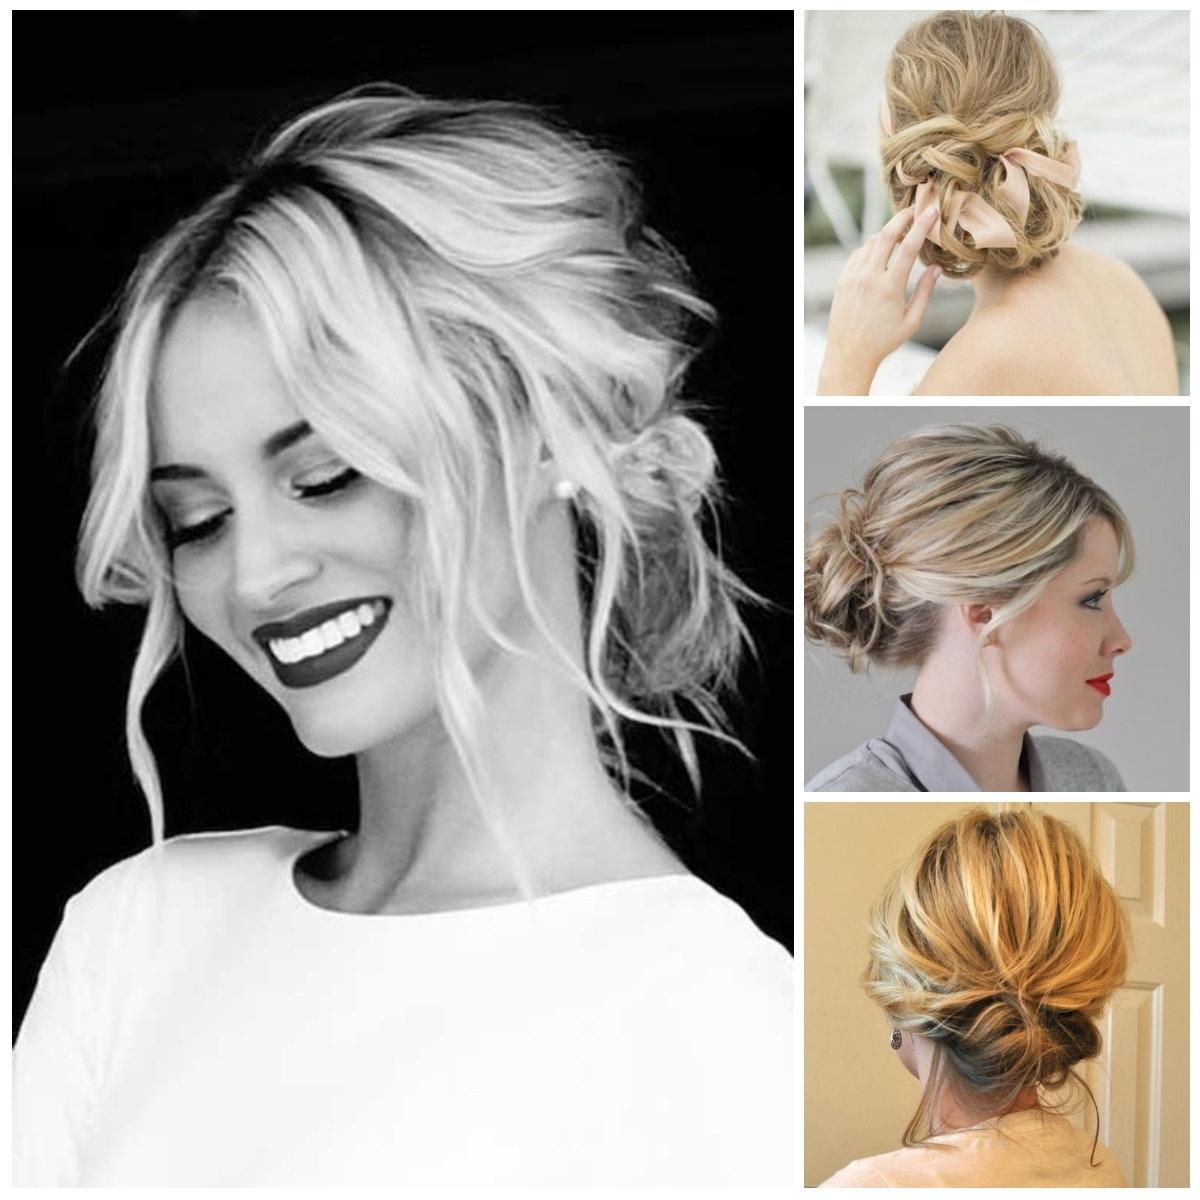 Hair Updos For Medium Hair – Hairstyle For Women & Man Intended For Updos For Medium Hair (View 6 of 15)